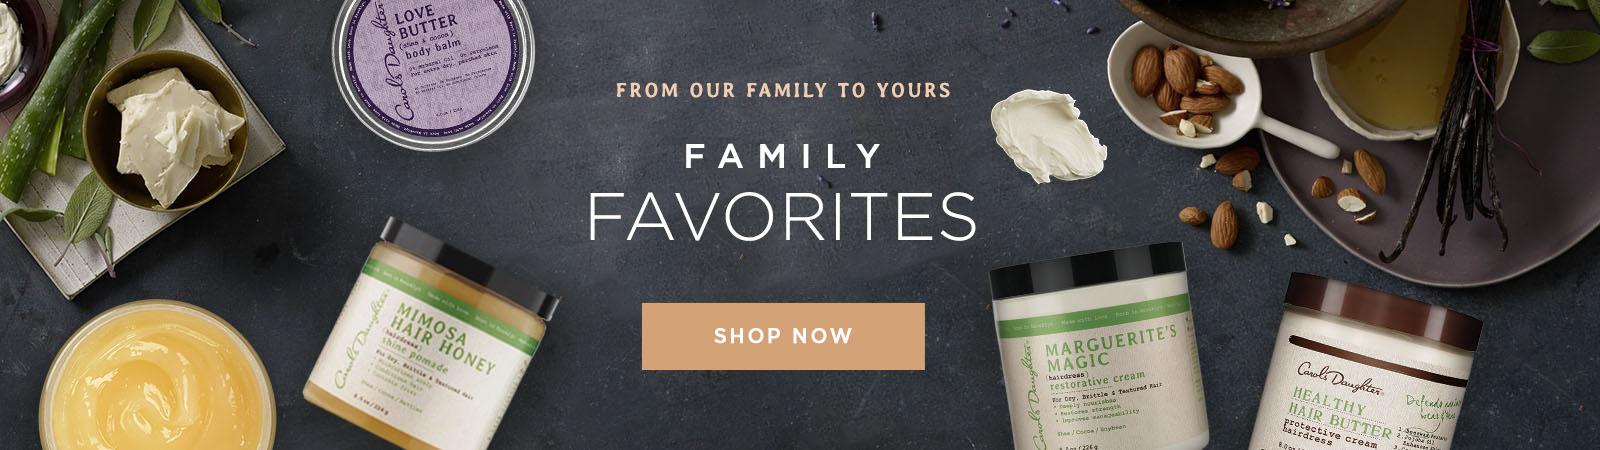 Shop Family Favorites